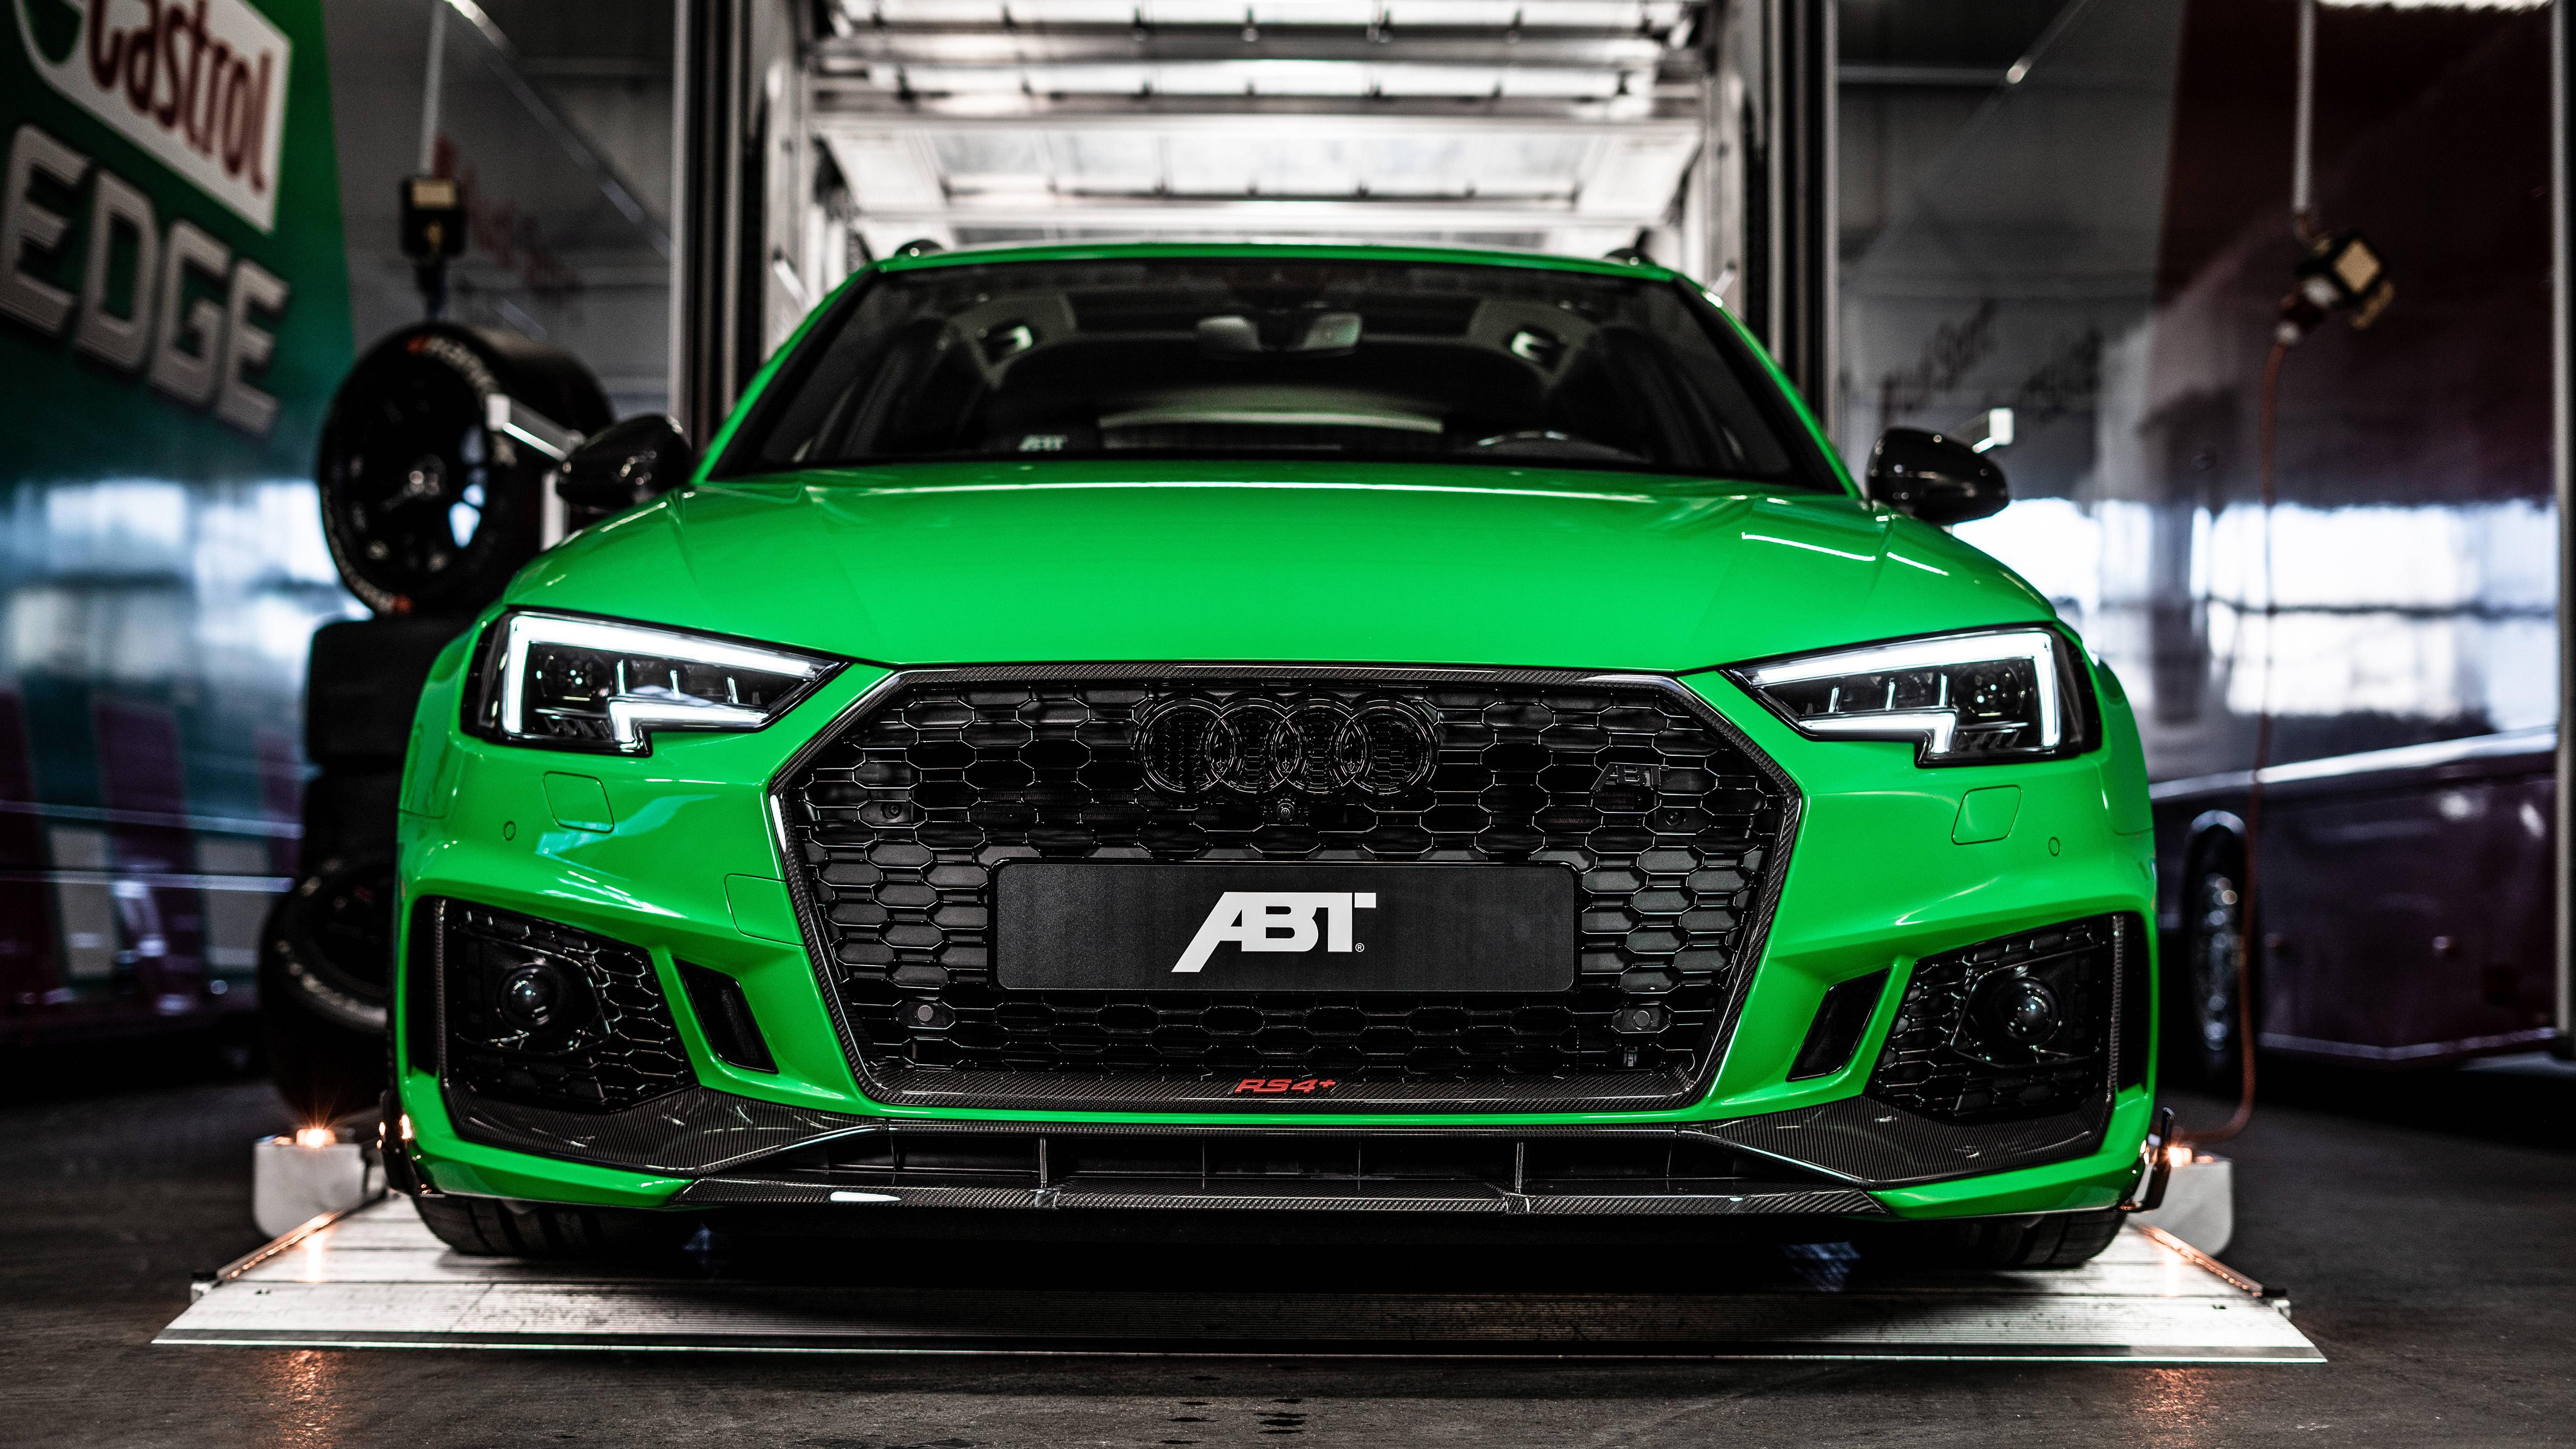 Abt Audi Rs4 2019 4k 2 Wallpaper Hd Car Wallpapers Id 12162